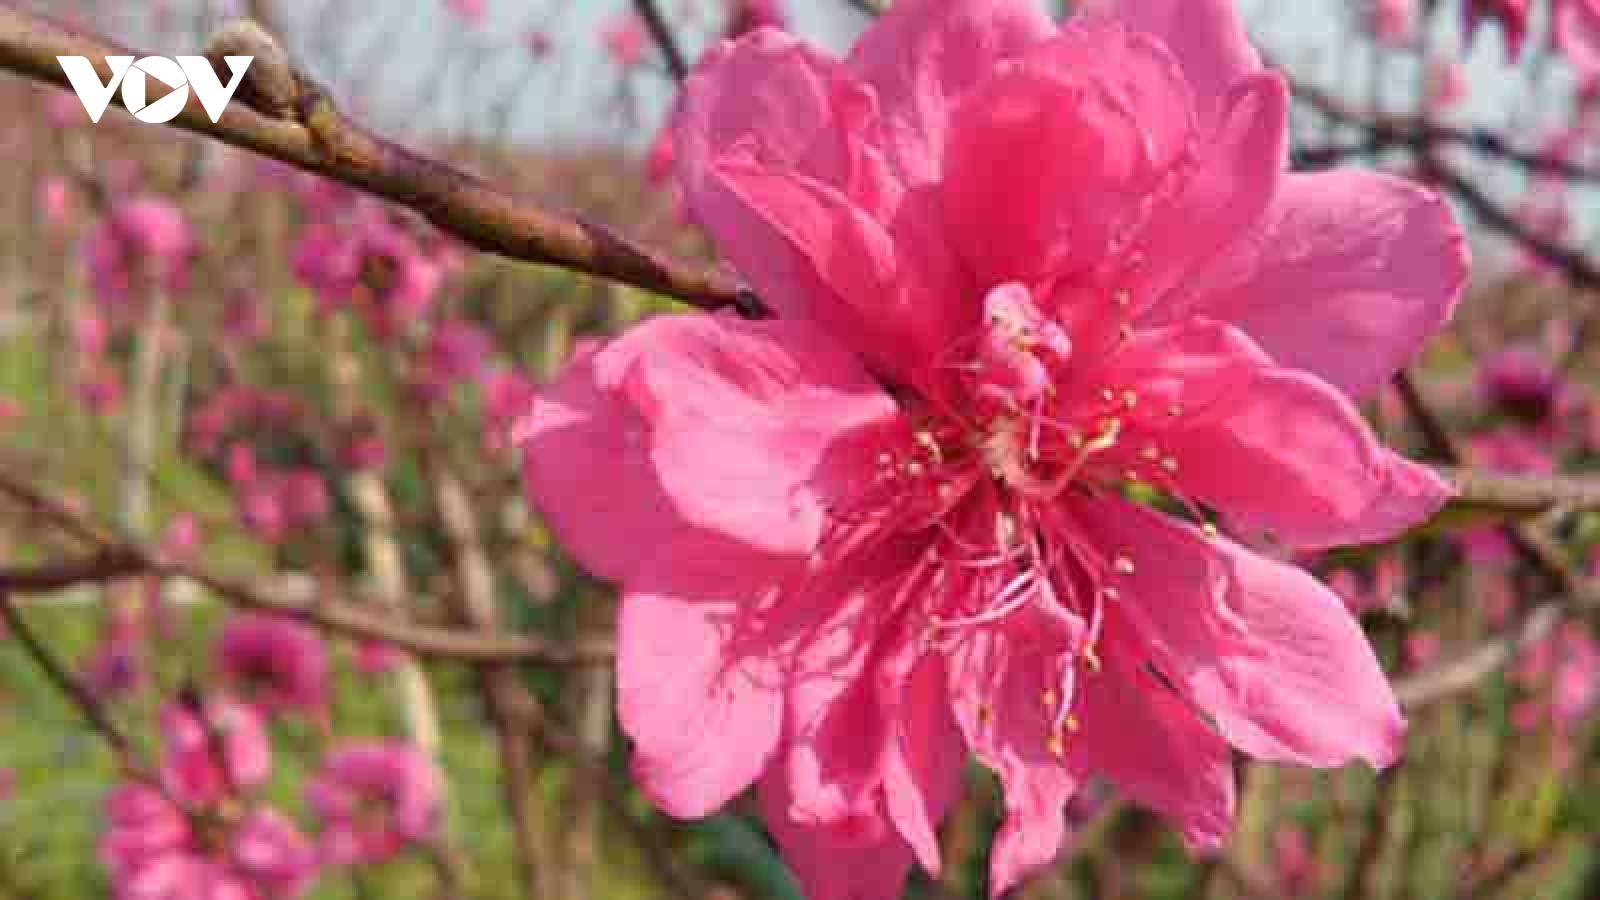 Nhat Tan peach blossoms in full bloom ahead of Tet